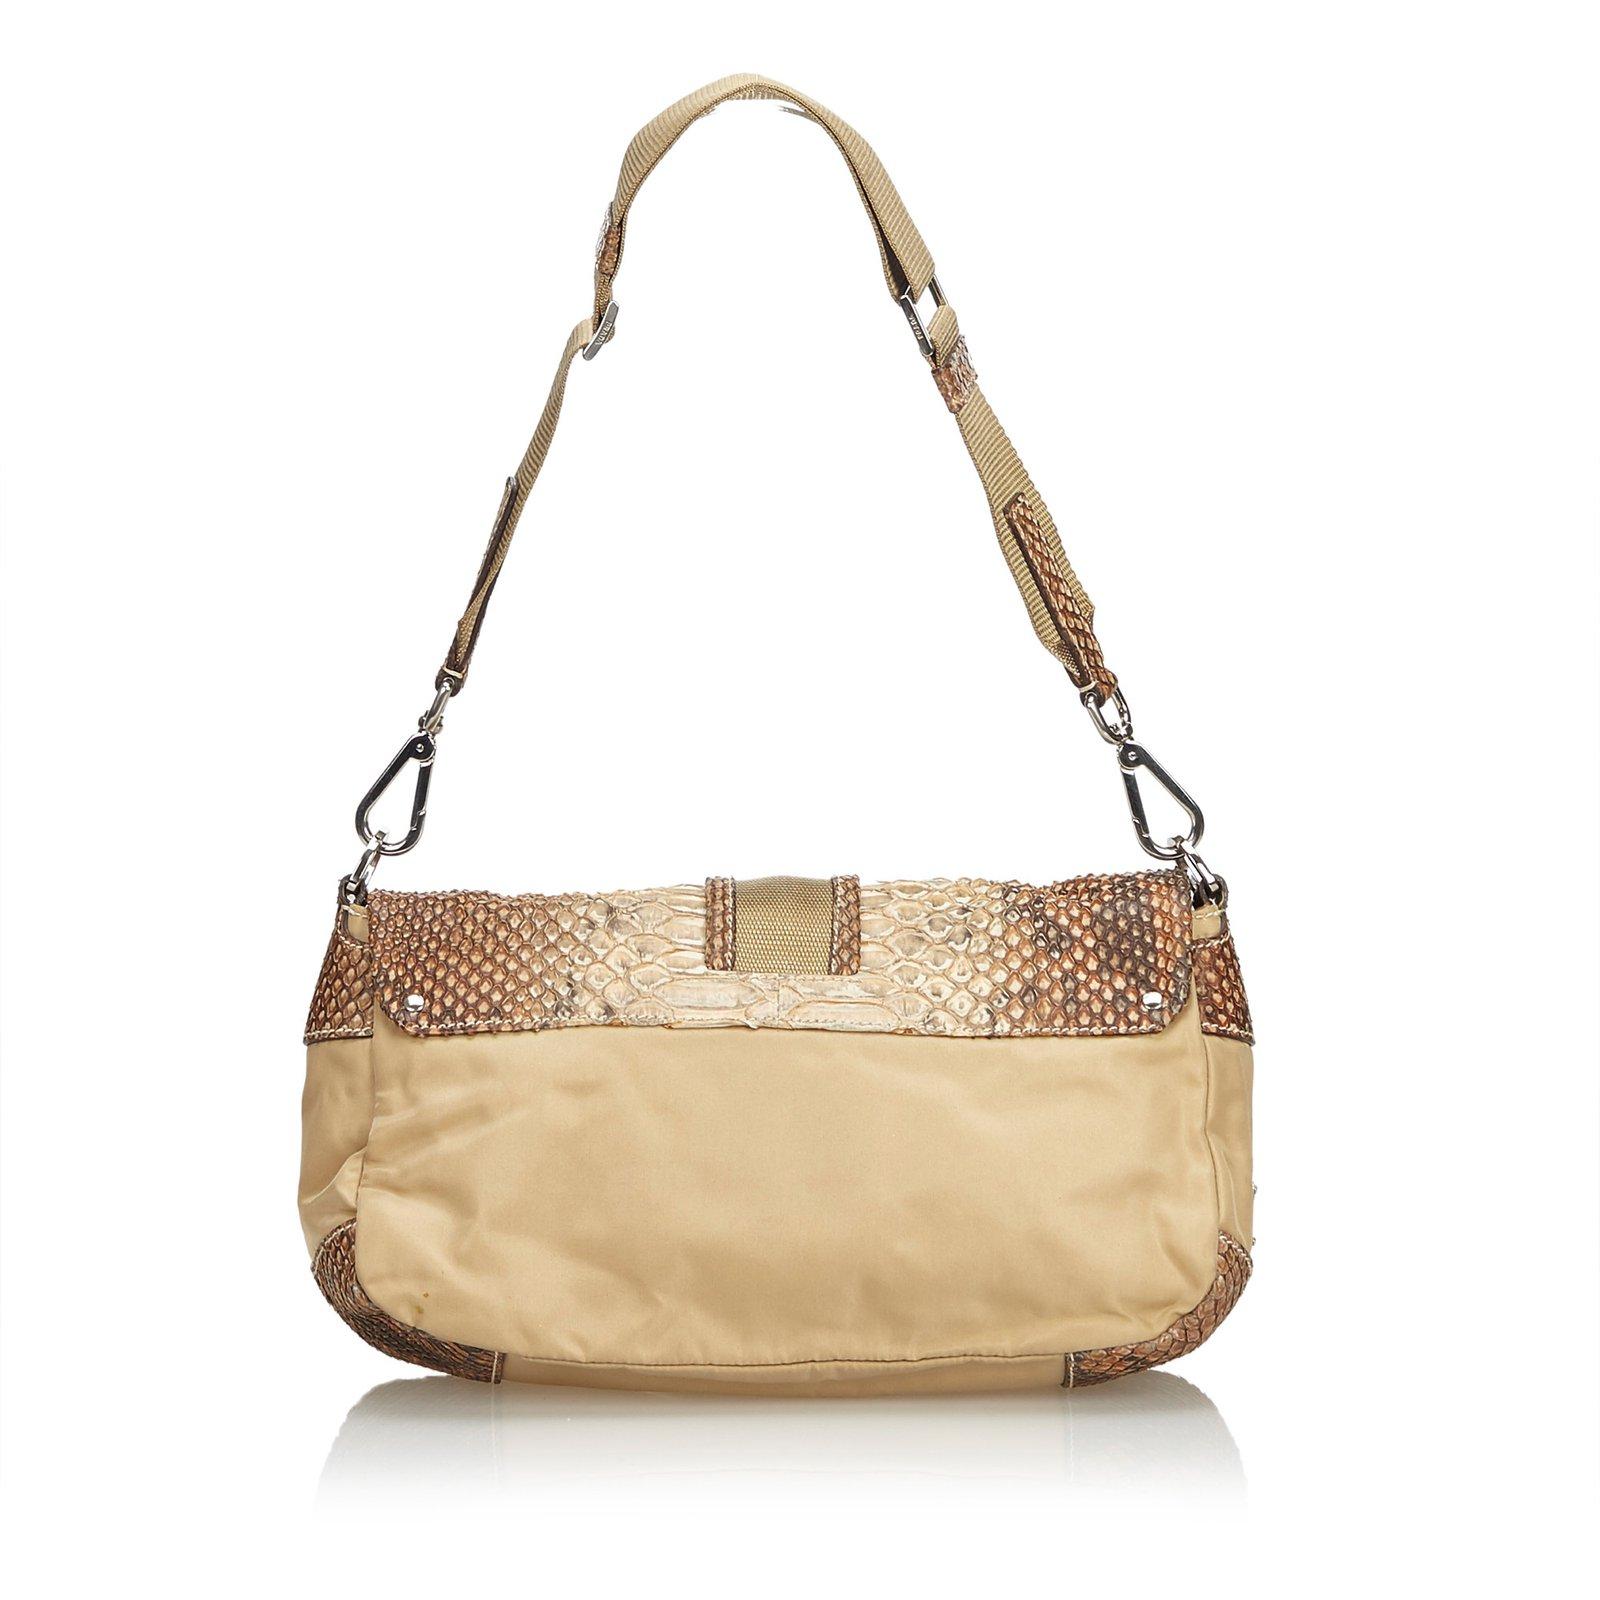 5025b00ce598 Prada Python Shoulder Bag Handbags Leather,Nylon,Cloth,Python Brown,Beige  ref.109956 - Joli Closet